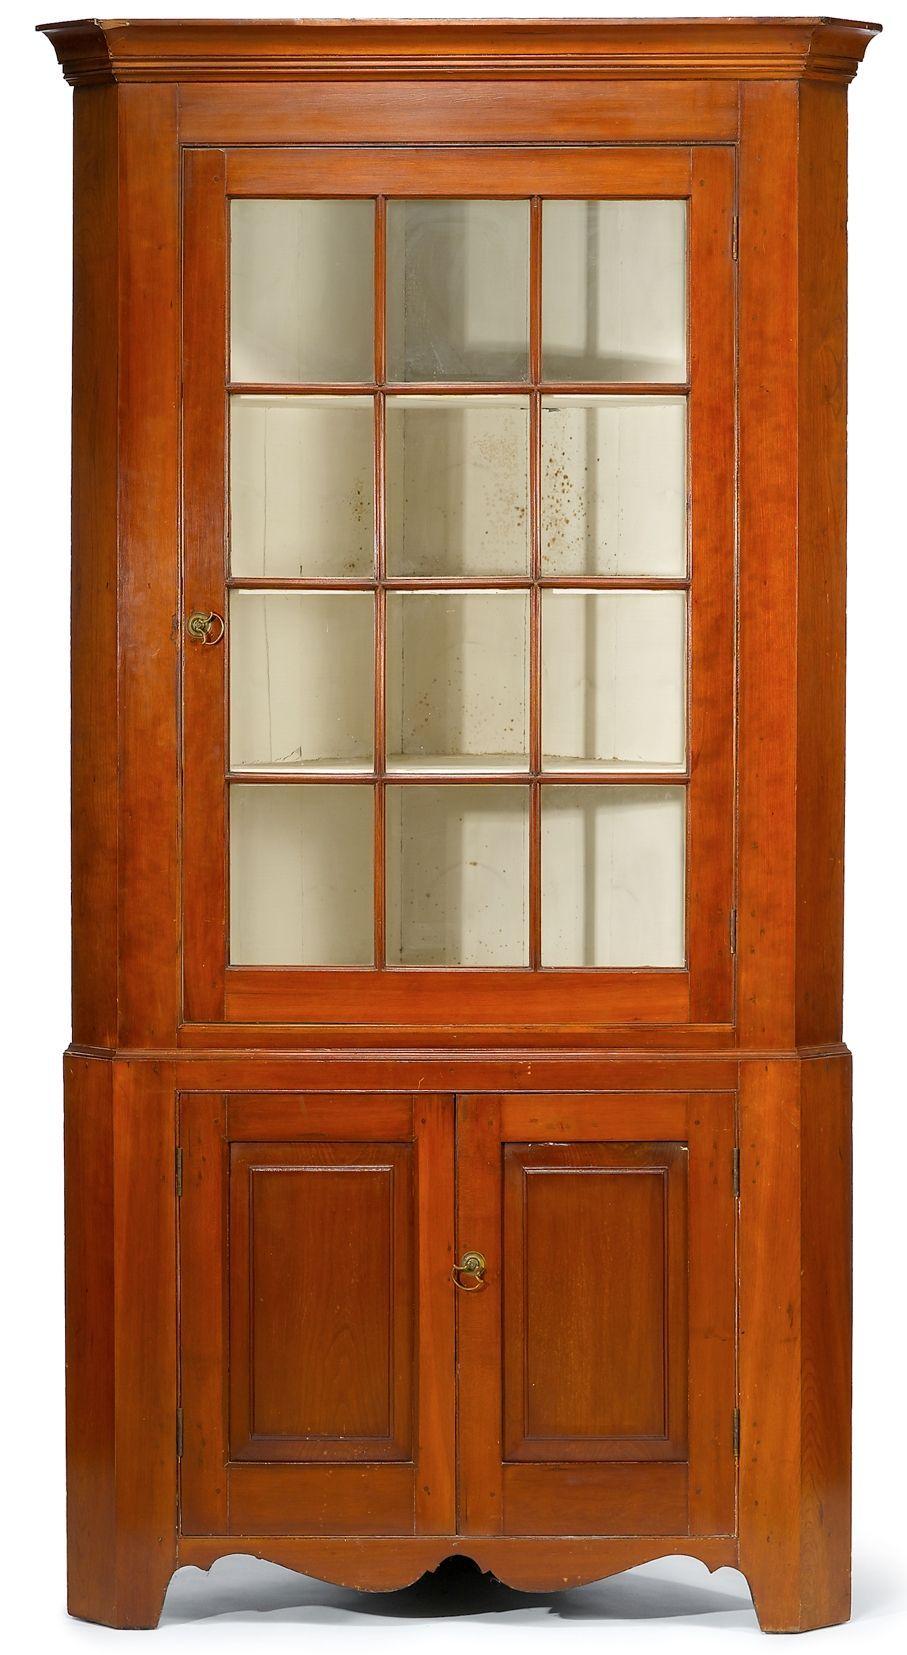 Antiques Classifieds Antiques Antique Furniture Antique · Antique Corner  CabinetCorner ... - Antiques Classifieds - Antique Corner Cupboard For Sale Antique Furniture